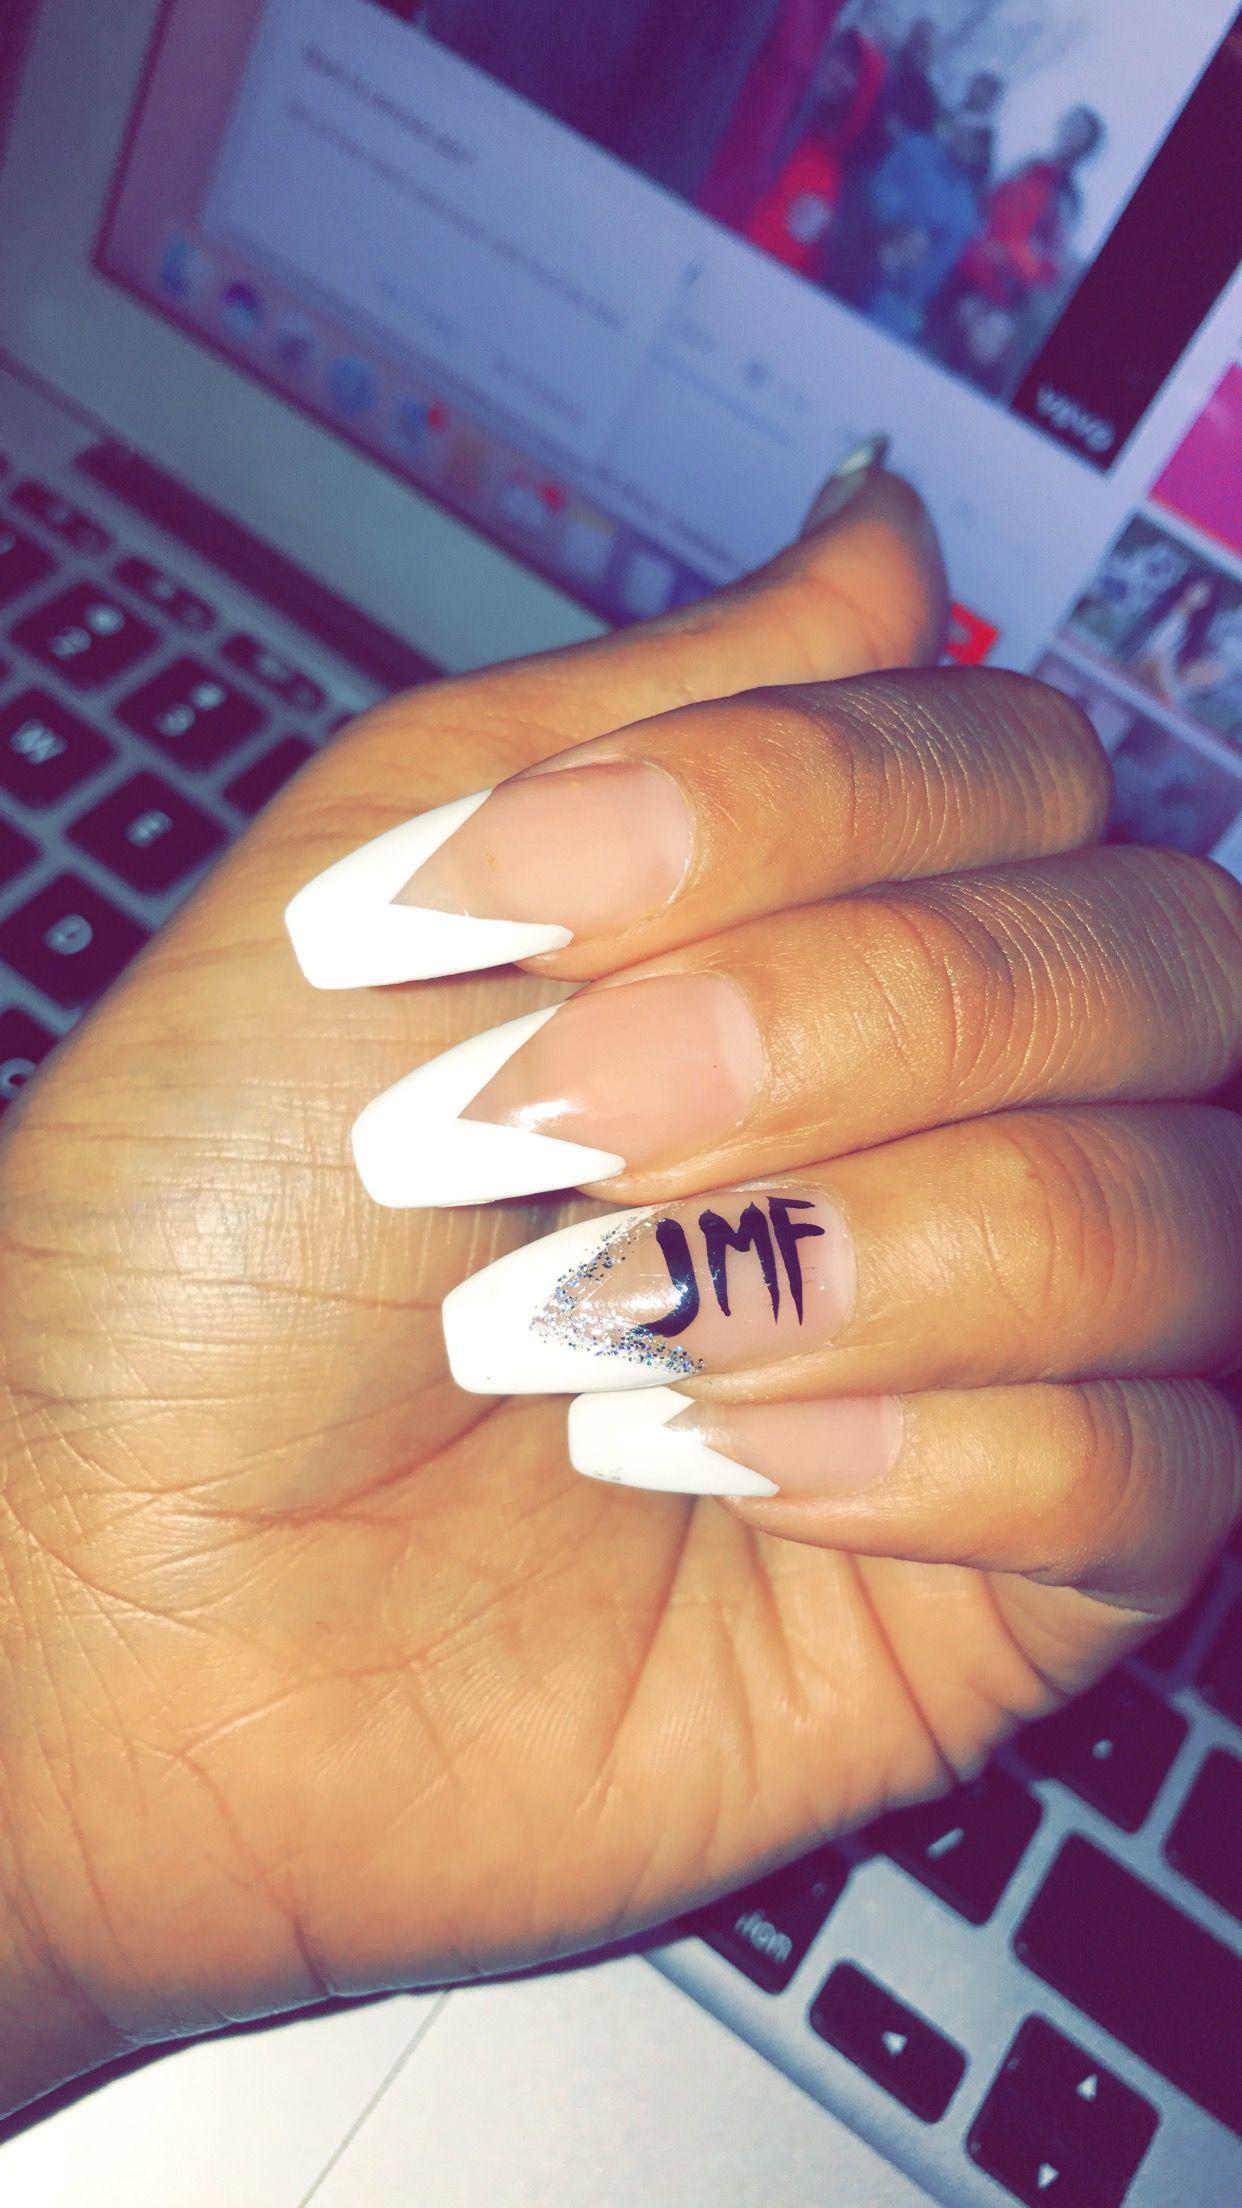 Nails With Initials Cute Nails Prom Nails Nails